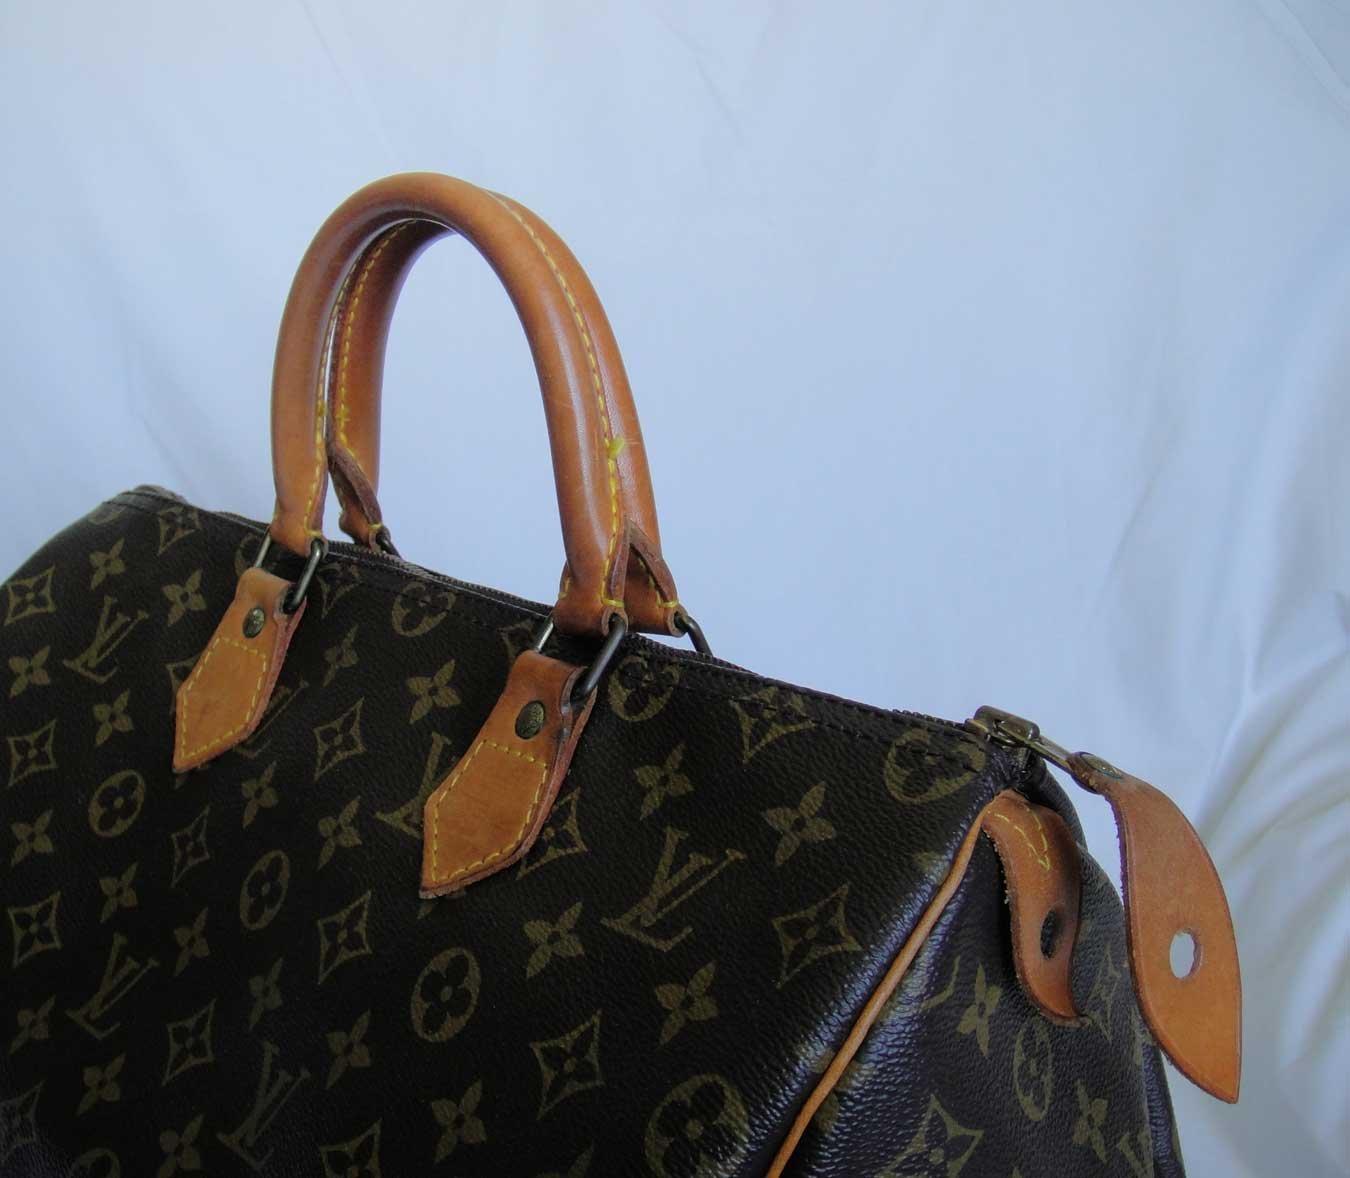 AUTHENTIC Pre Owned Louis Vuitton monogram SPEEDY 35